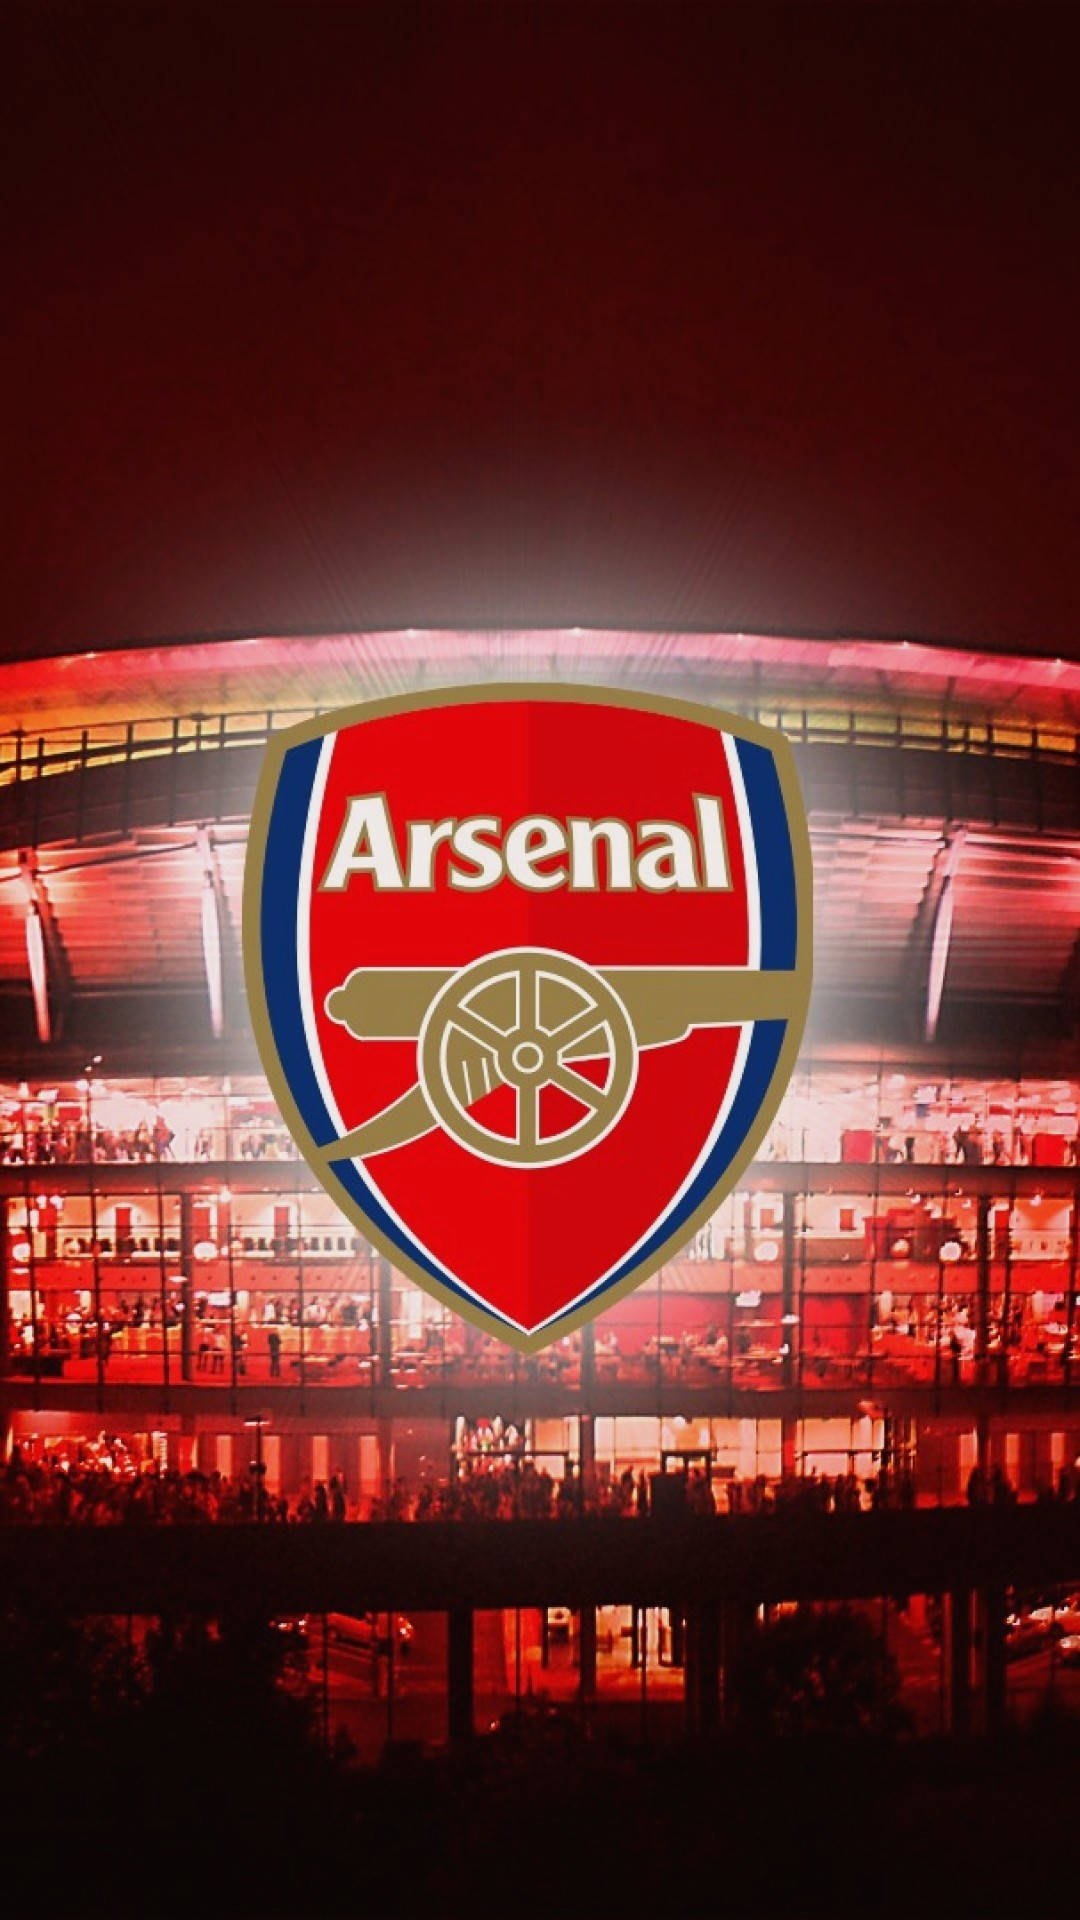 Arsenal Fc Wallpaper 76 Images